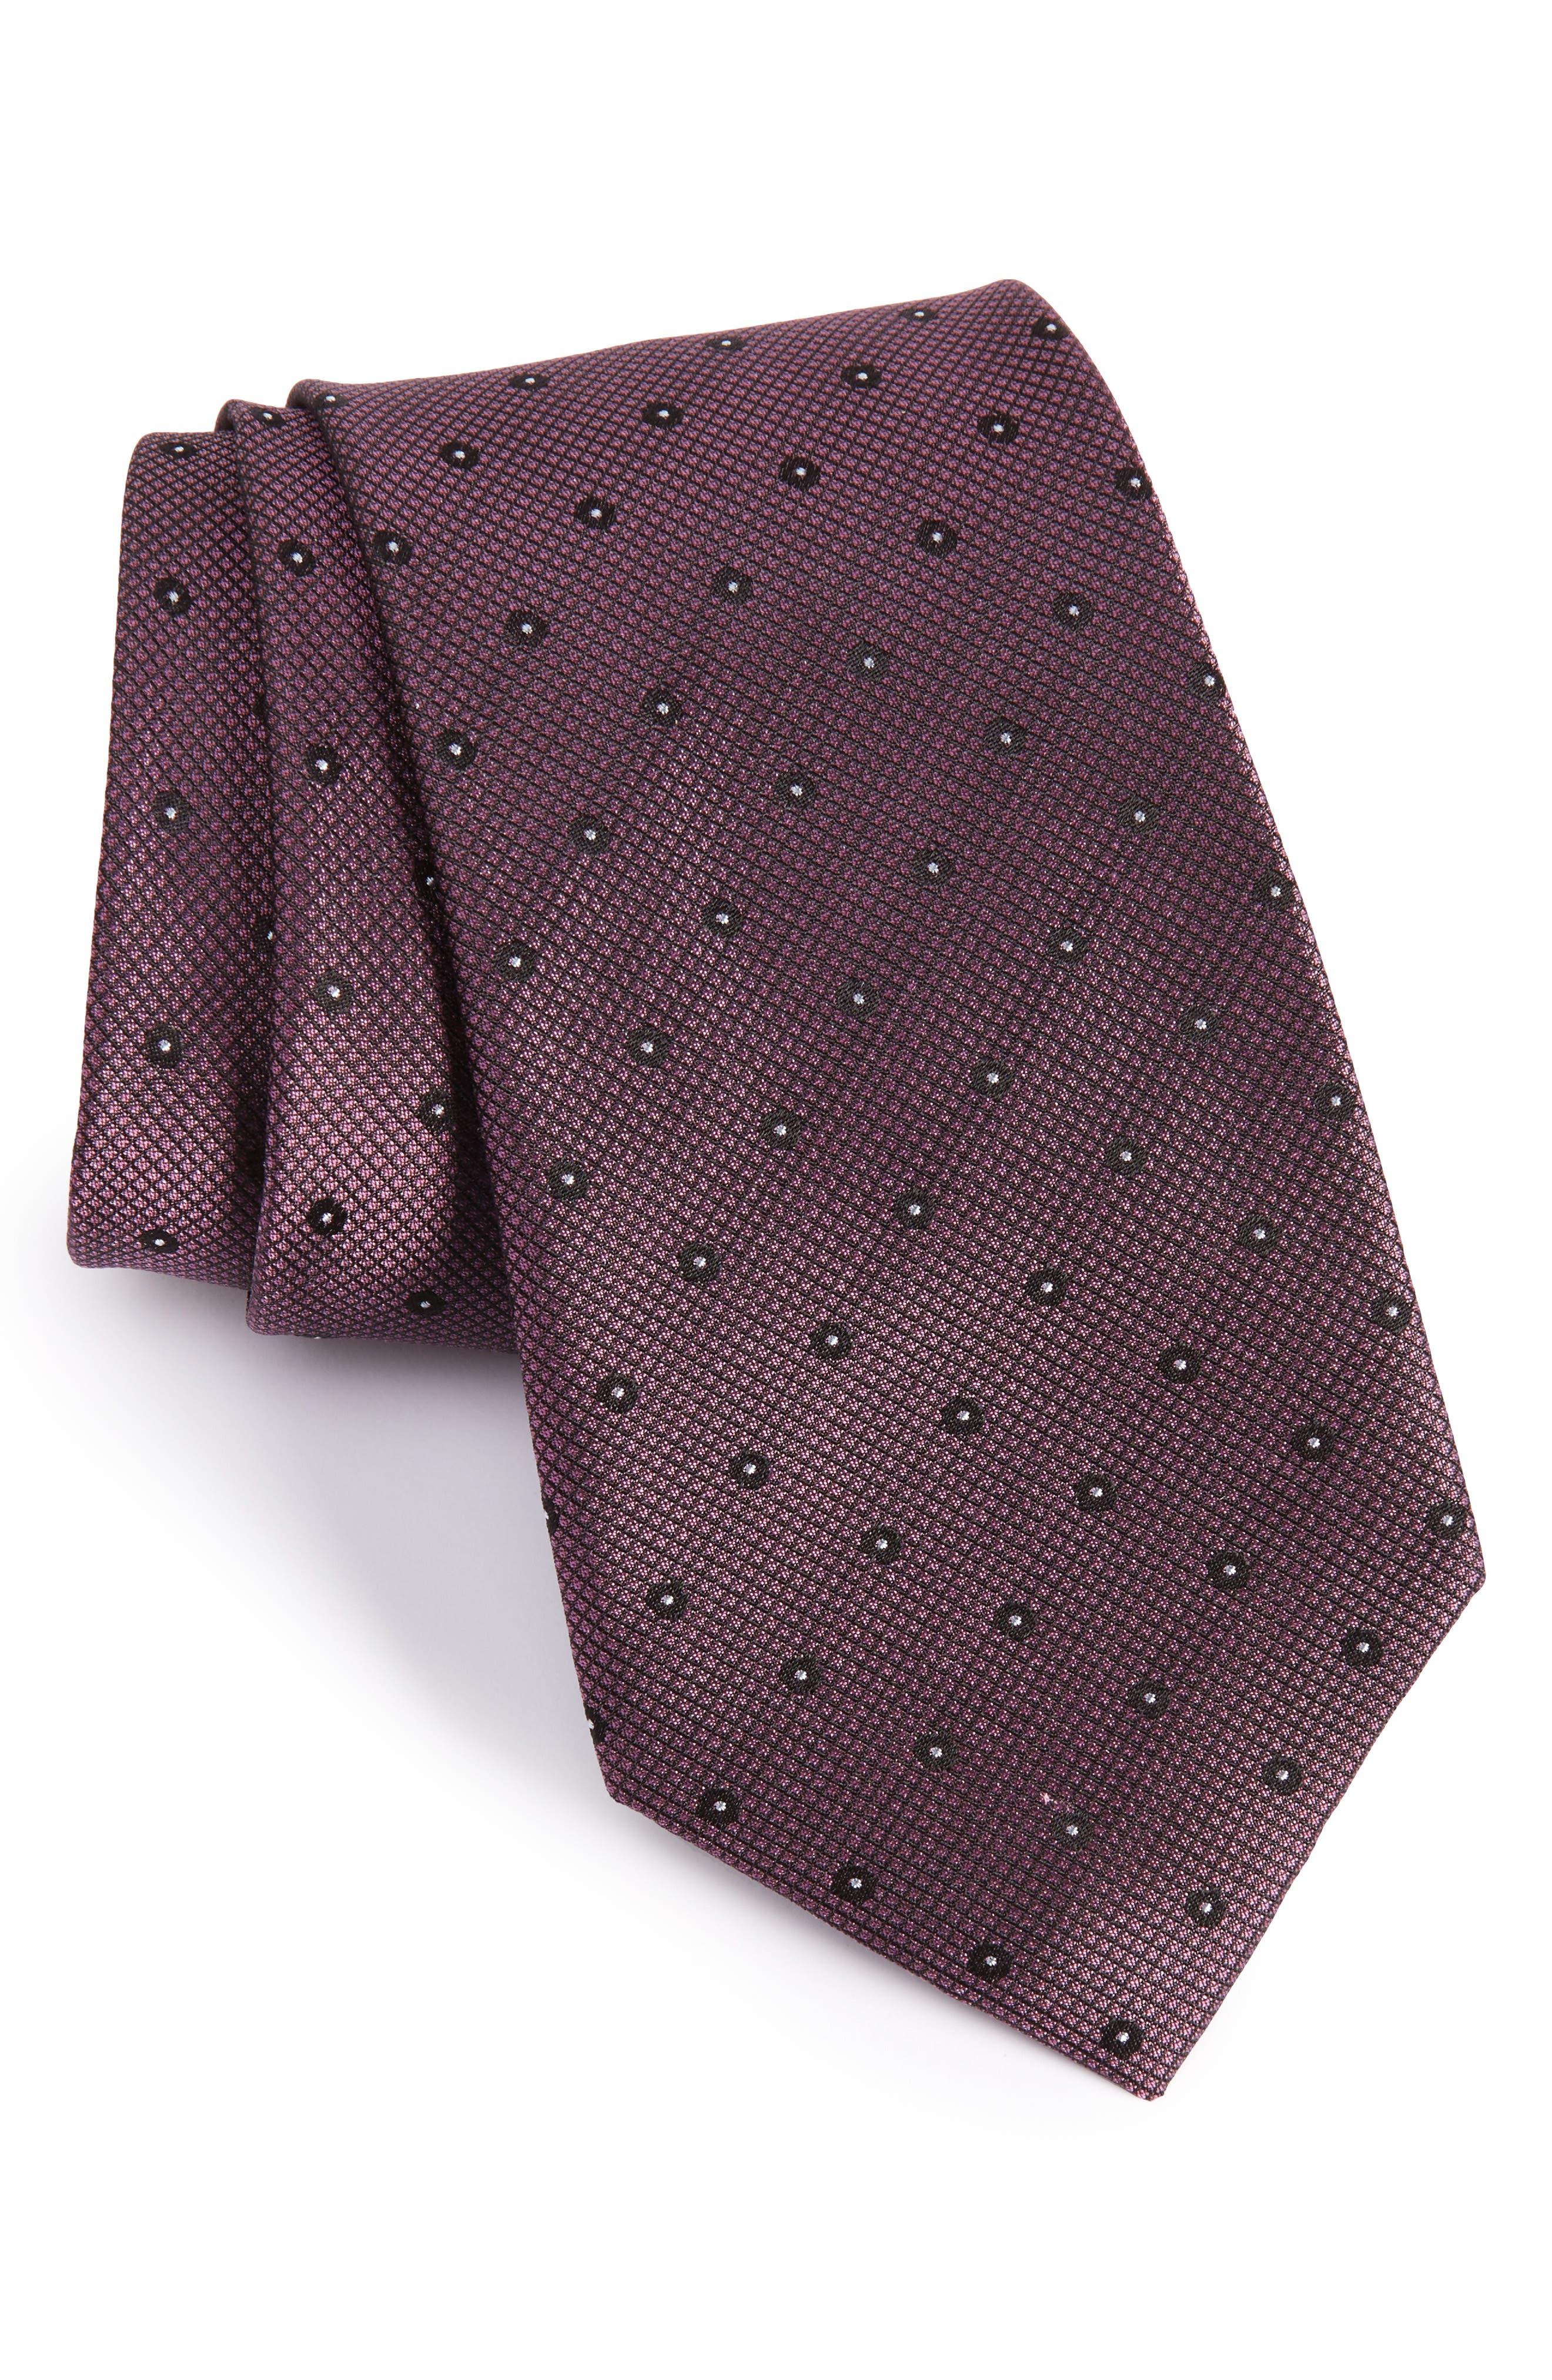 CALIBRATE Handmade Dot Silk Tie